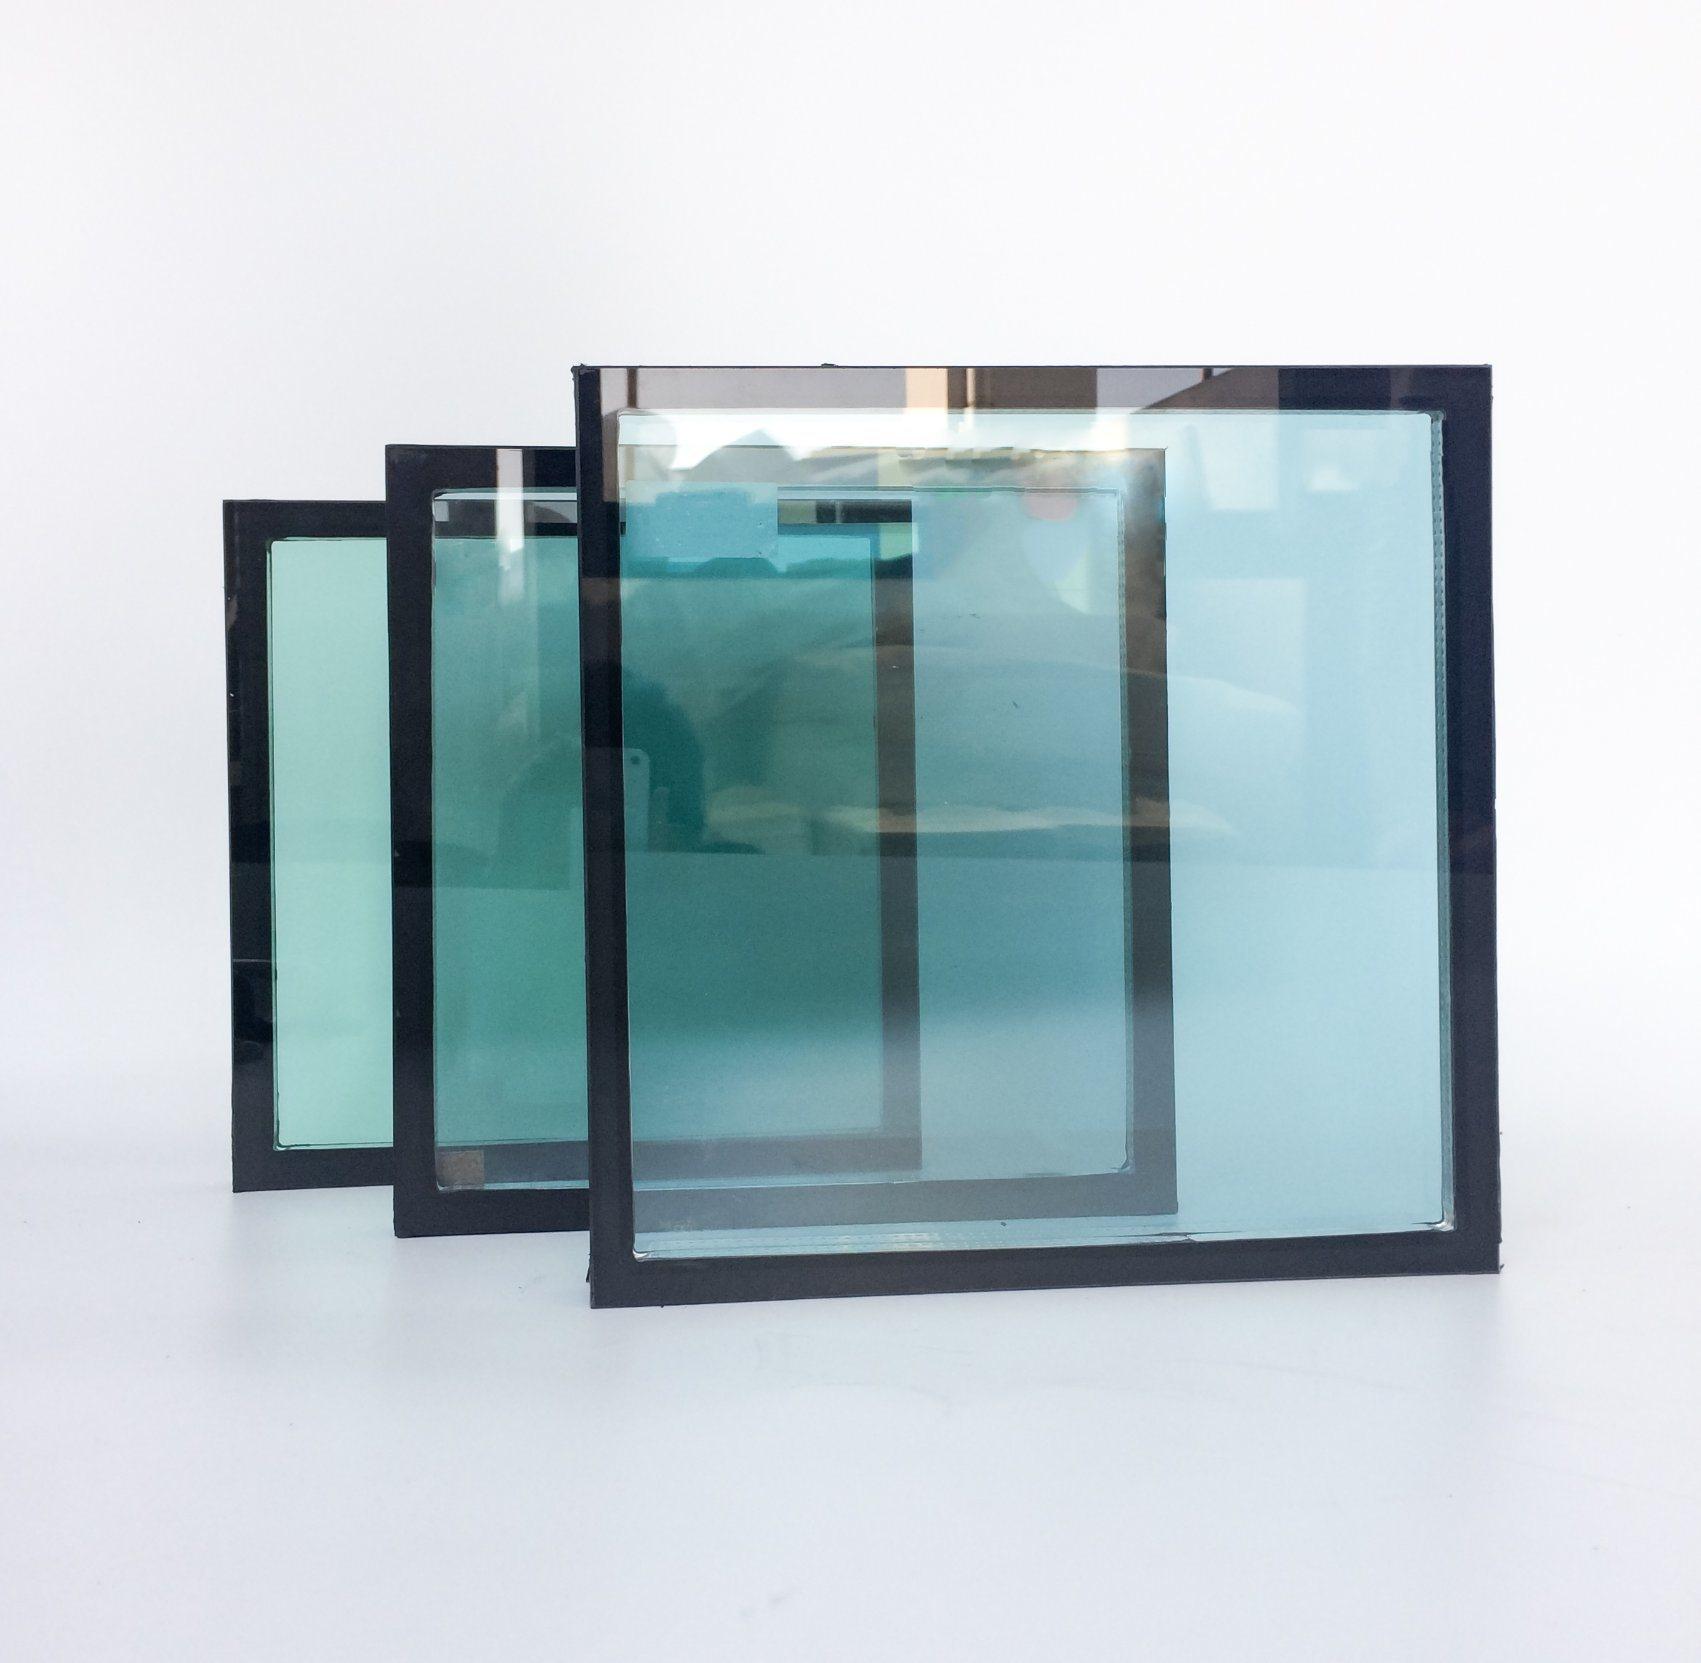 Energy Saving Low E Insulated Glass for High Raise Building